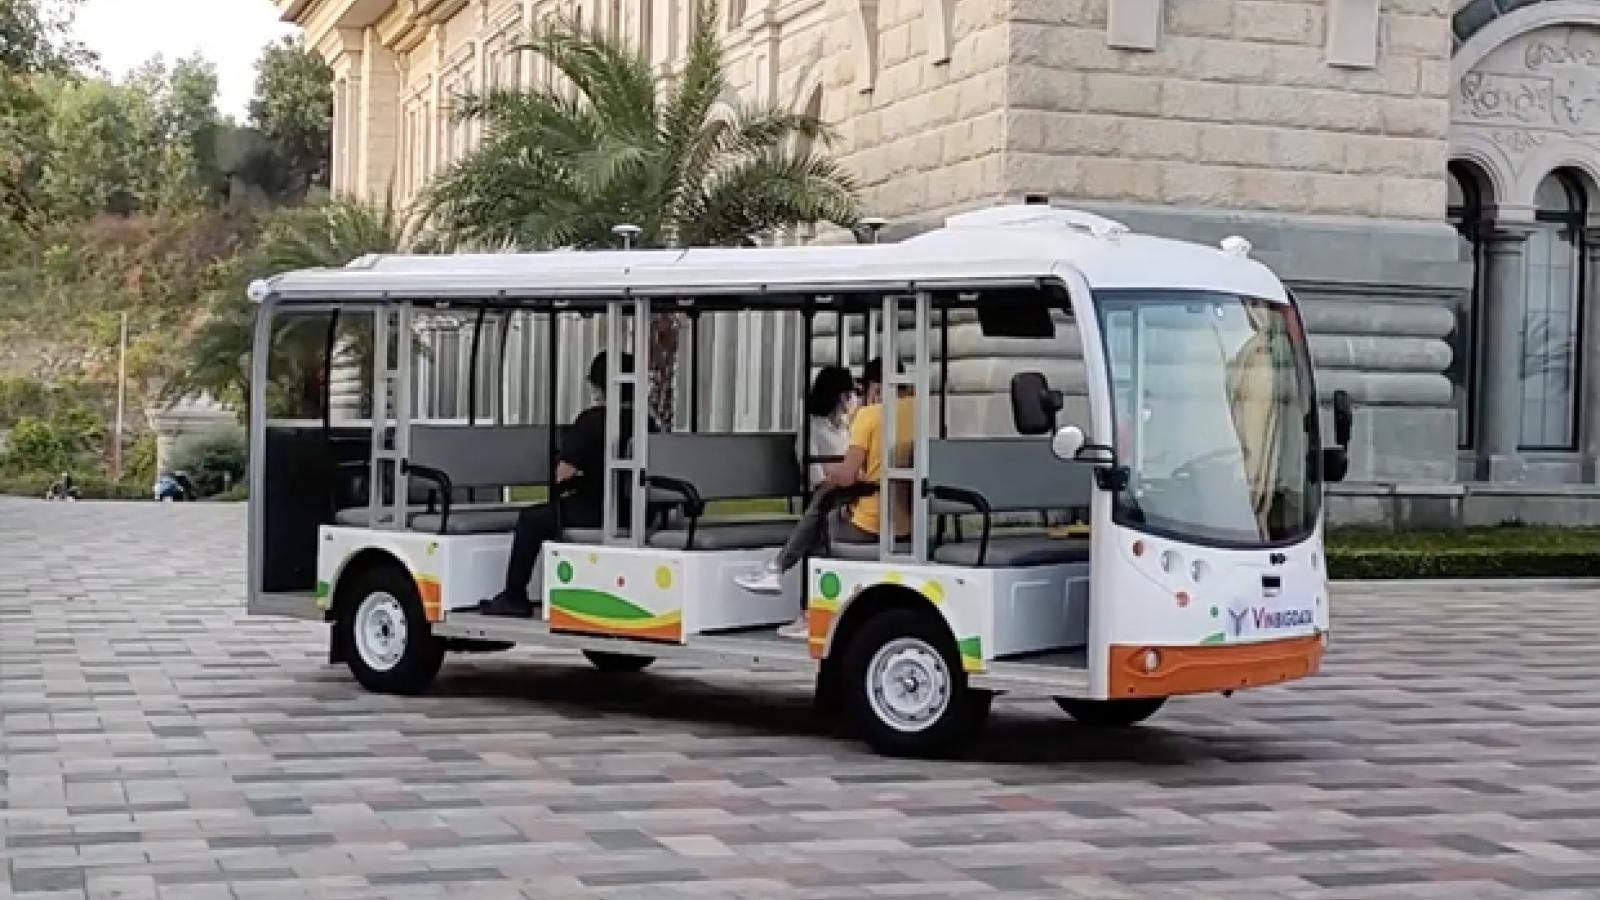 Vingroup tests self-driving electric vehicle in Nha Trang